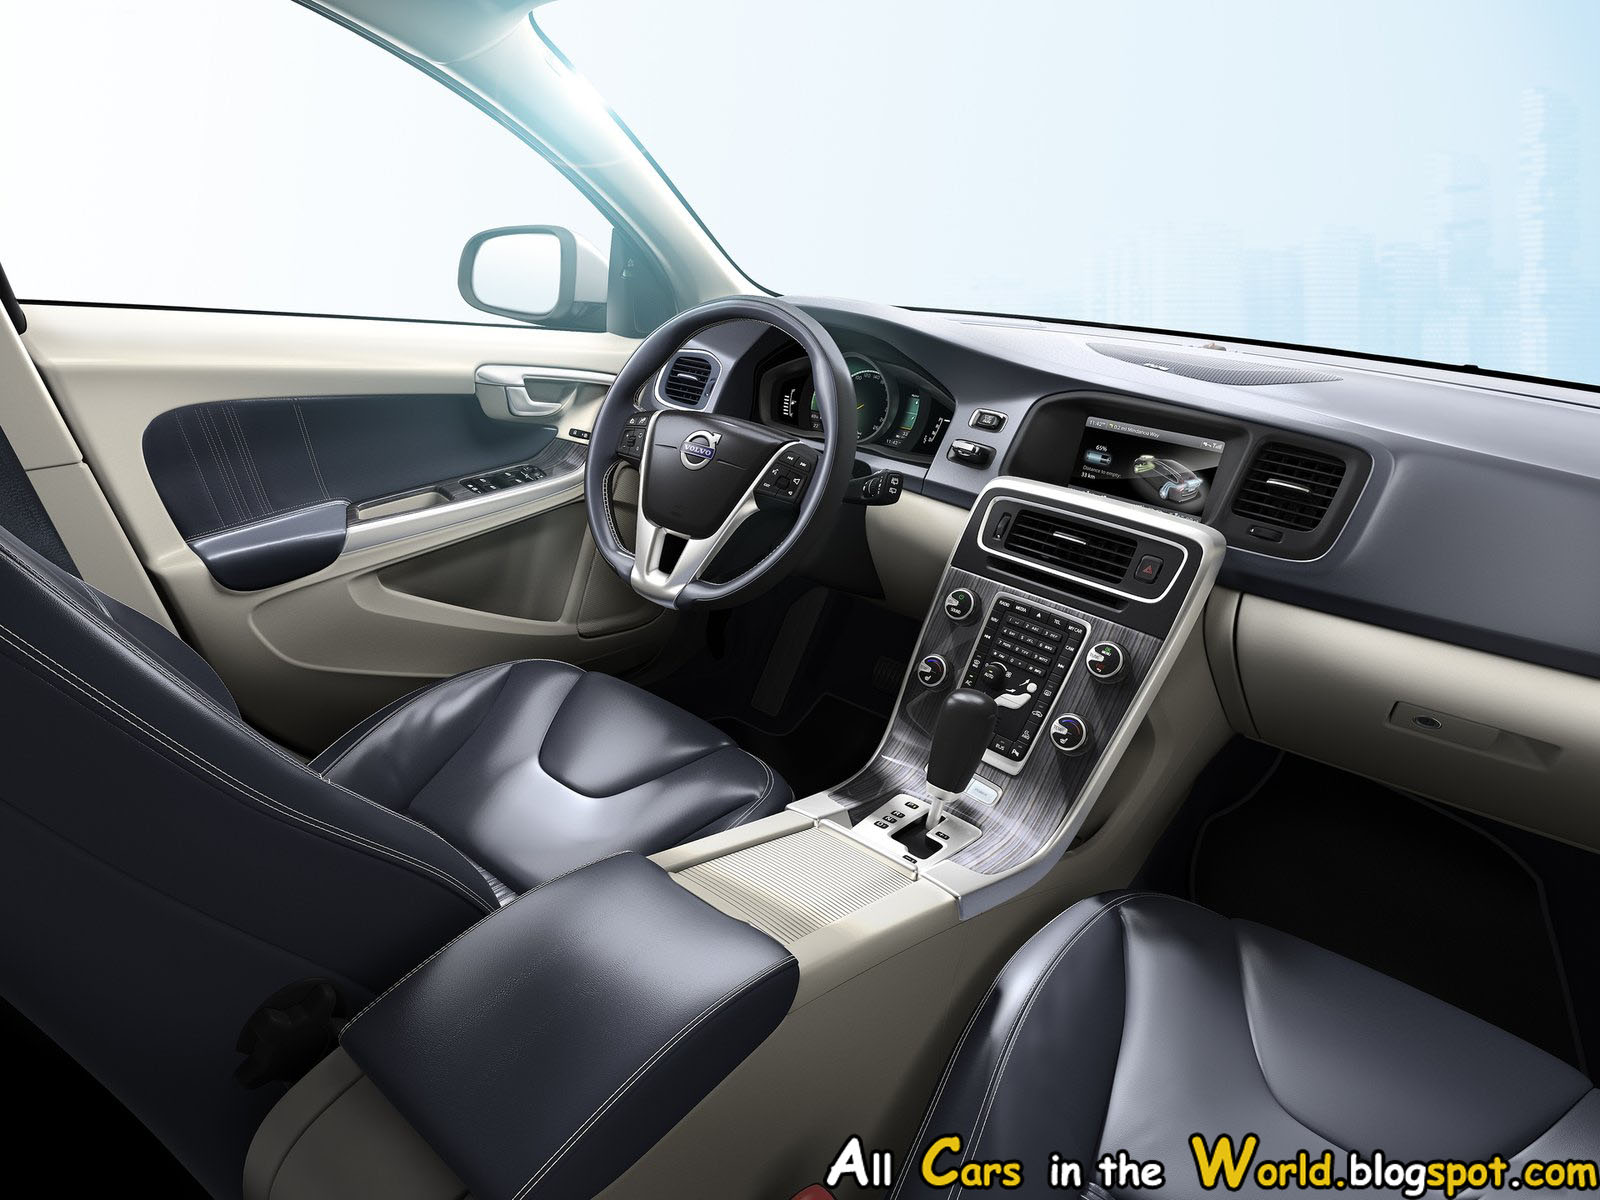 http://4.bp.blogspot.com/-ClV8MLZfchQ/UDia1-K3UiI/AAAAAAAACcw/FwrCwoBL3DY/s1600/Volvo-V60_Plug-in_Hybrid_2013_1600x1200_wallpaper_0a.jpg